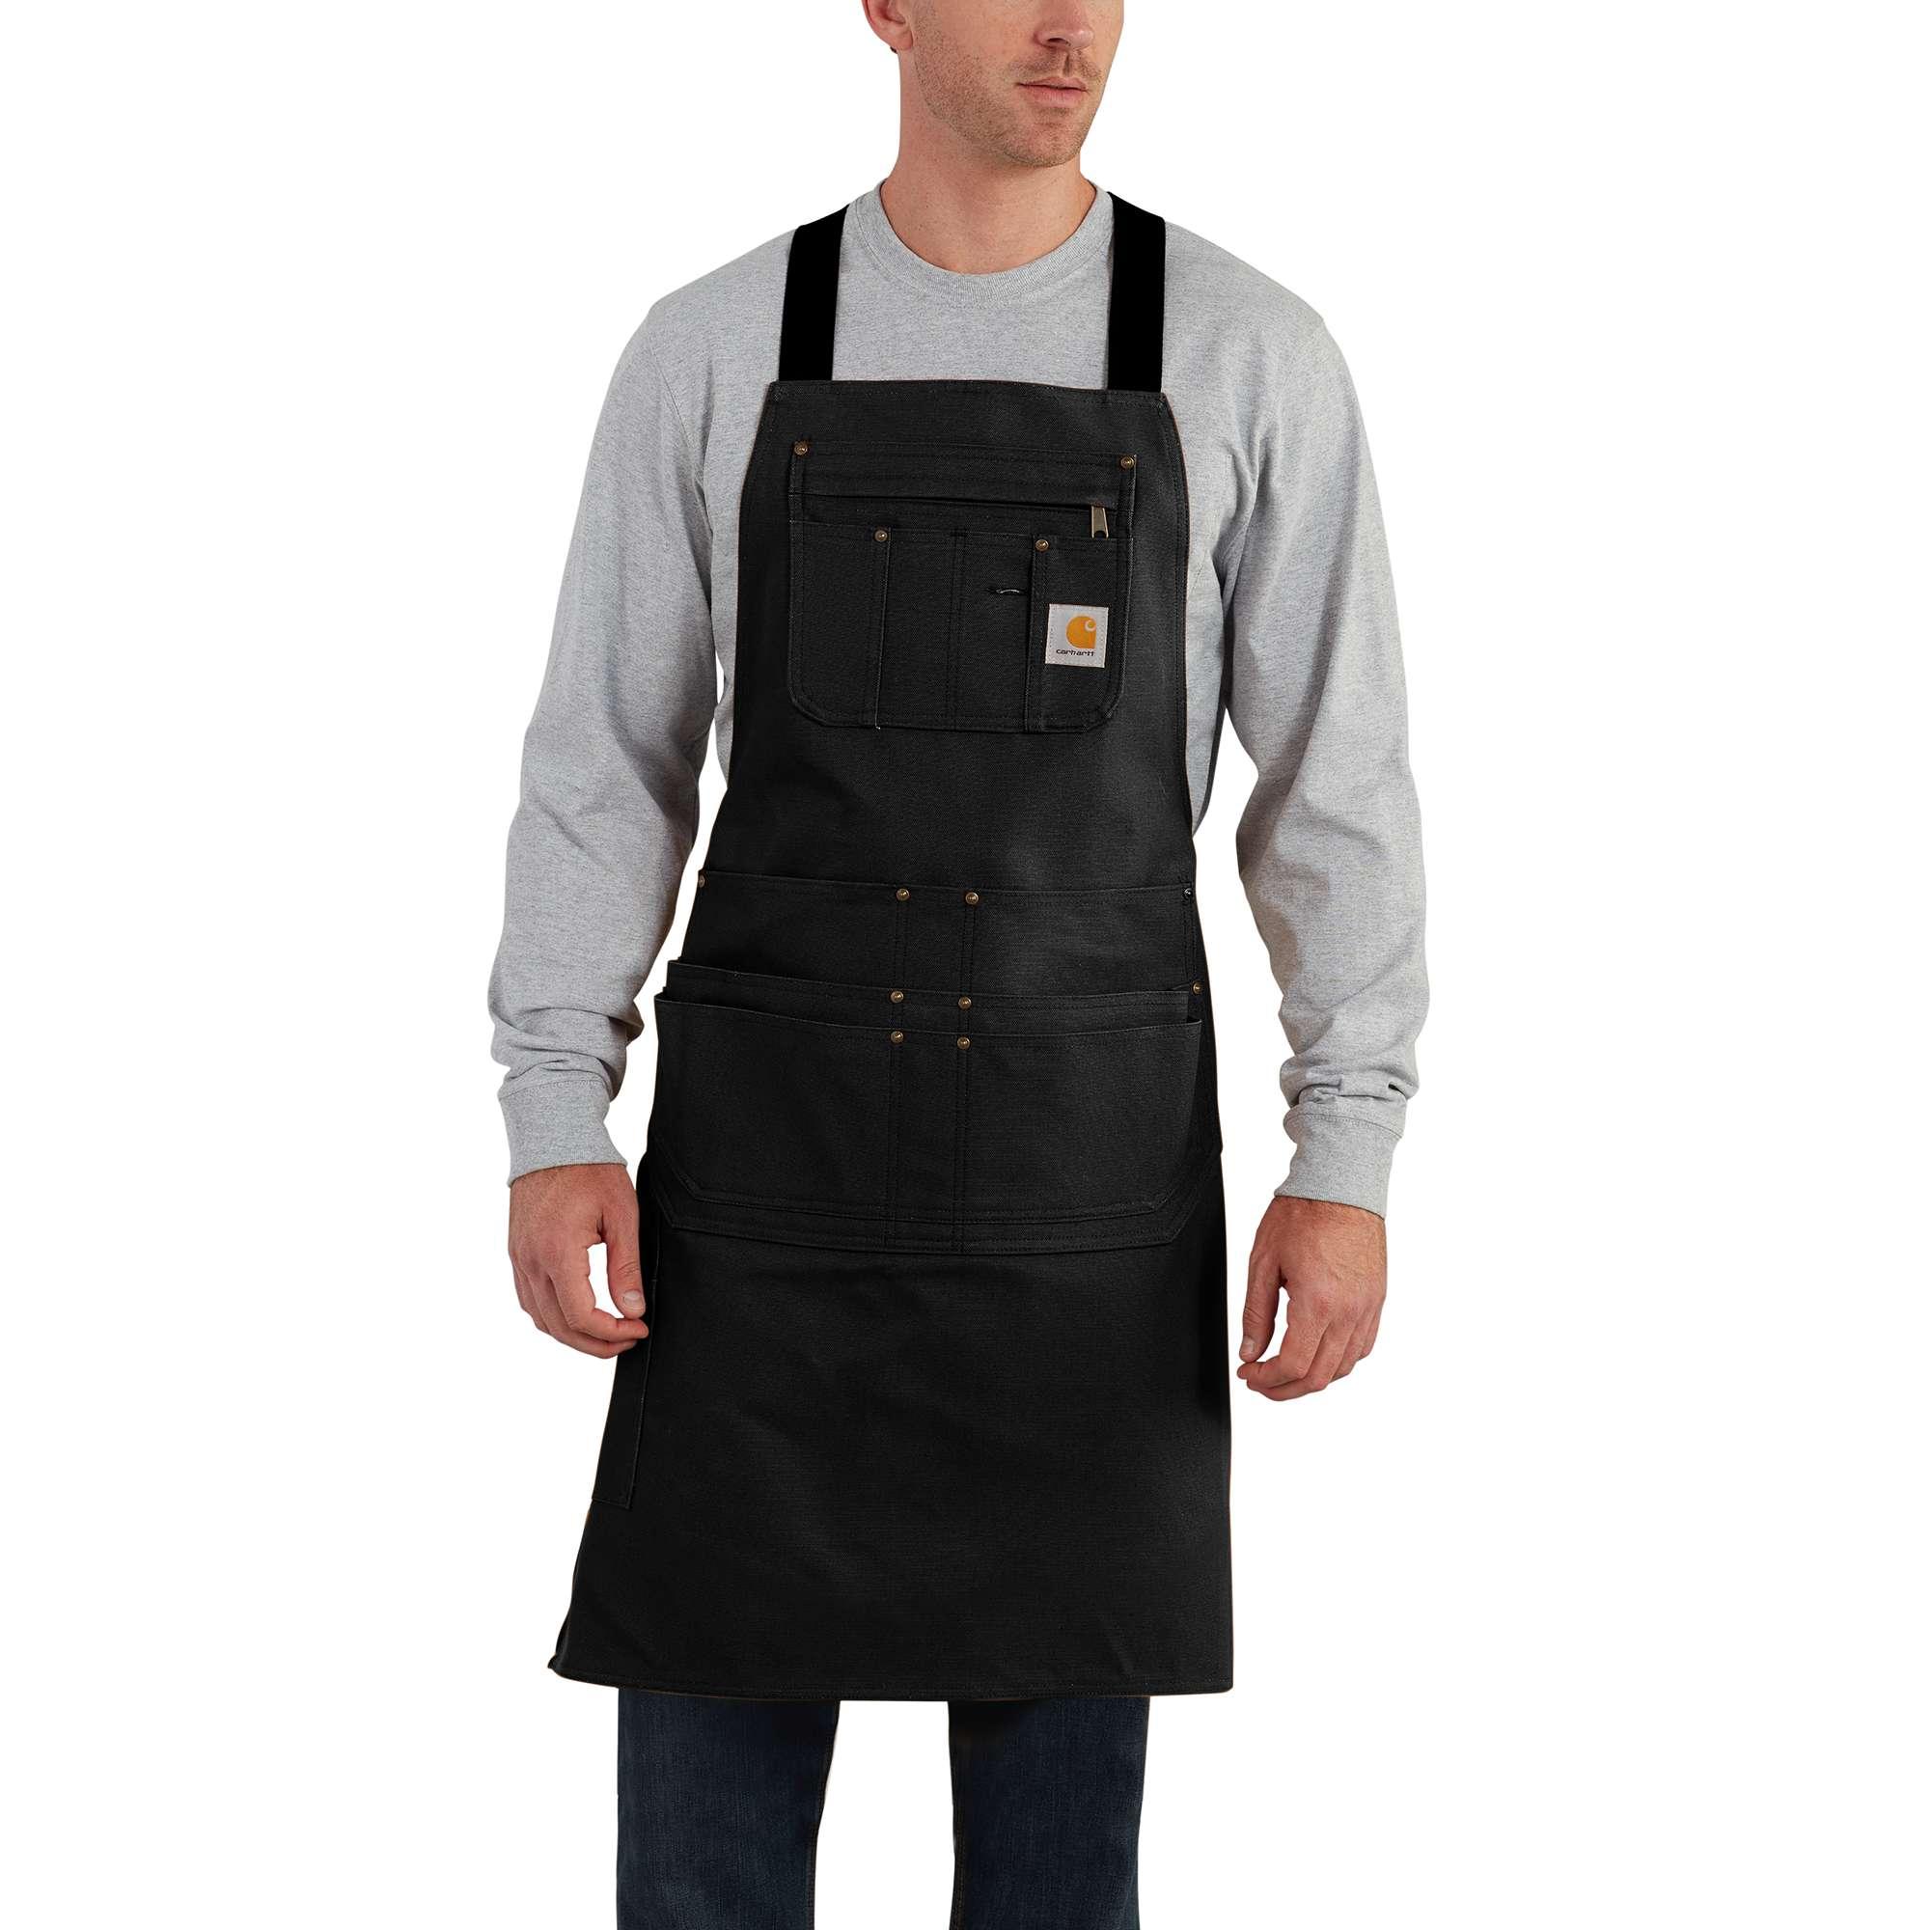 BFY Women Men/'s Apron Shoulder Straps Waist Tie With 2 Front Pockets for Artist